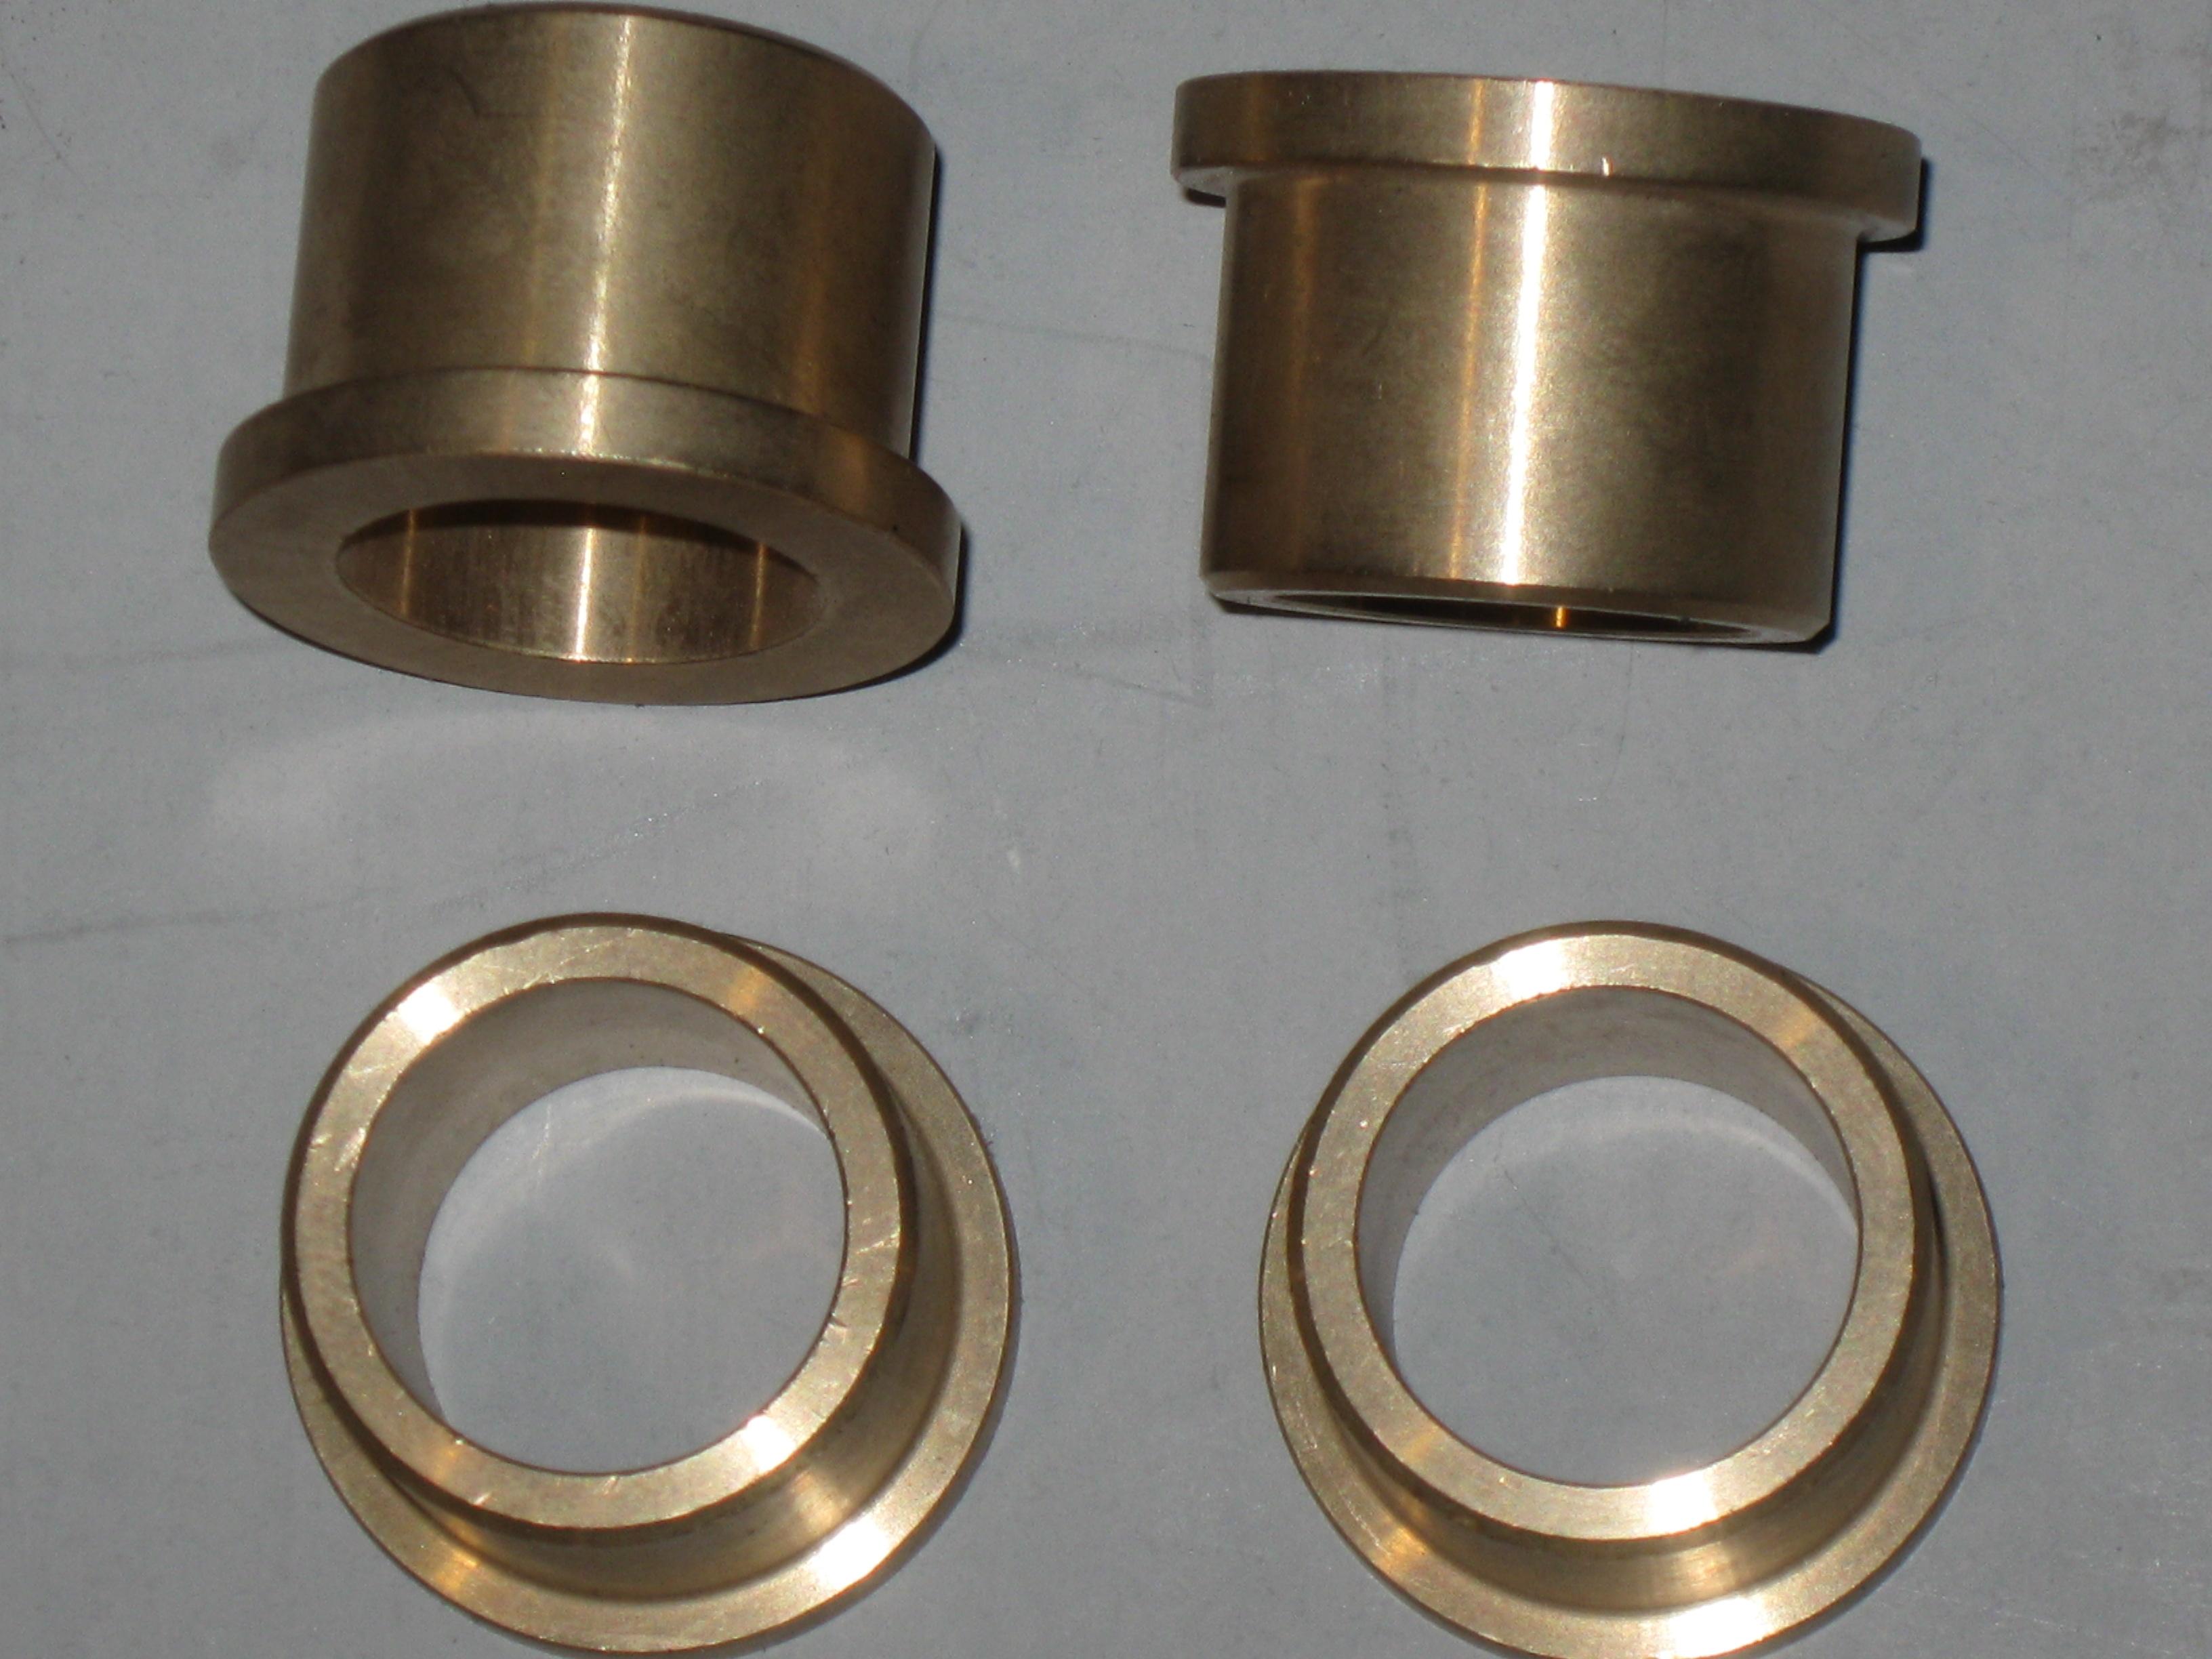 CB350 bronze swingarm bushings + rear wheel bearing kit- new-img_6051.jpg